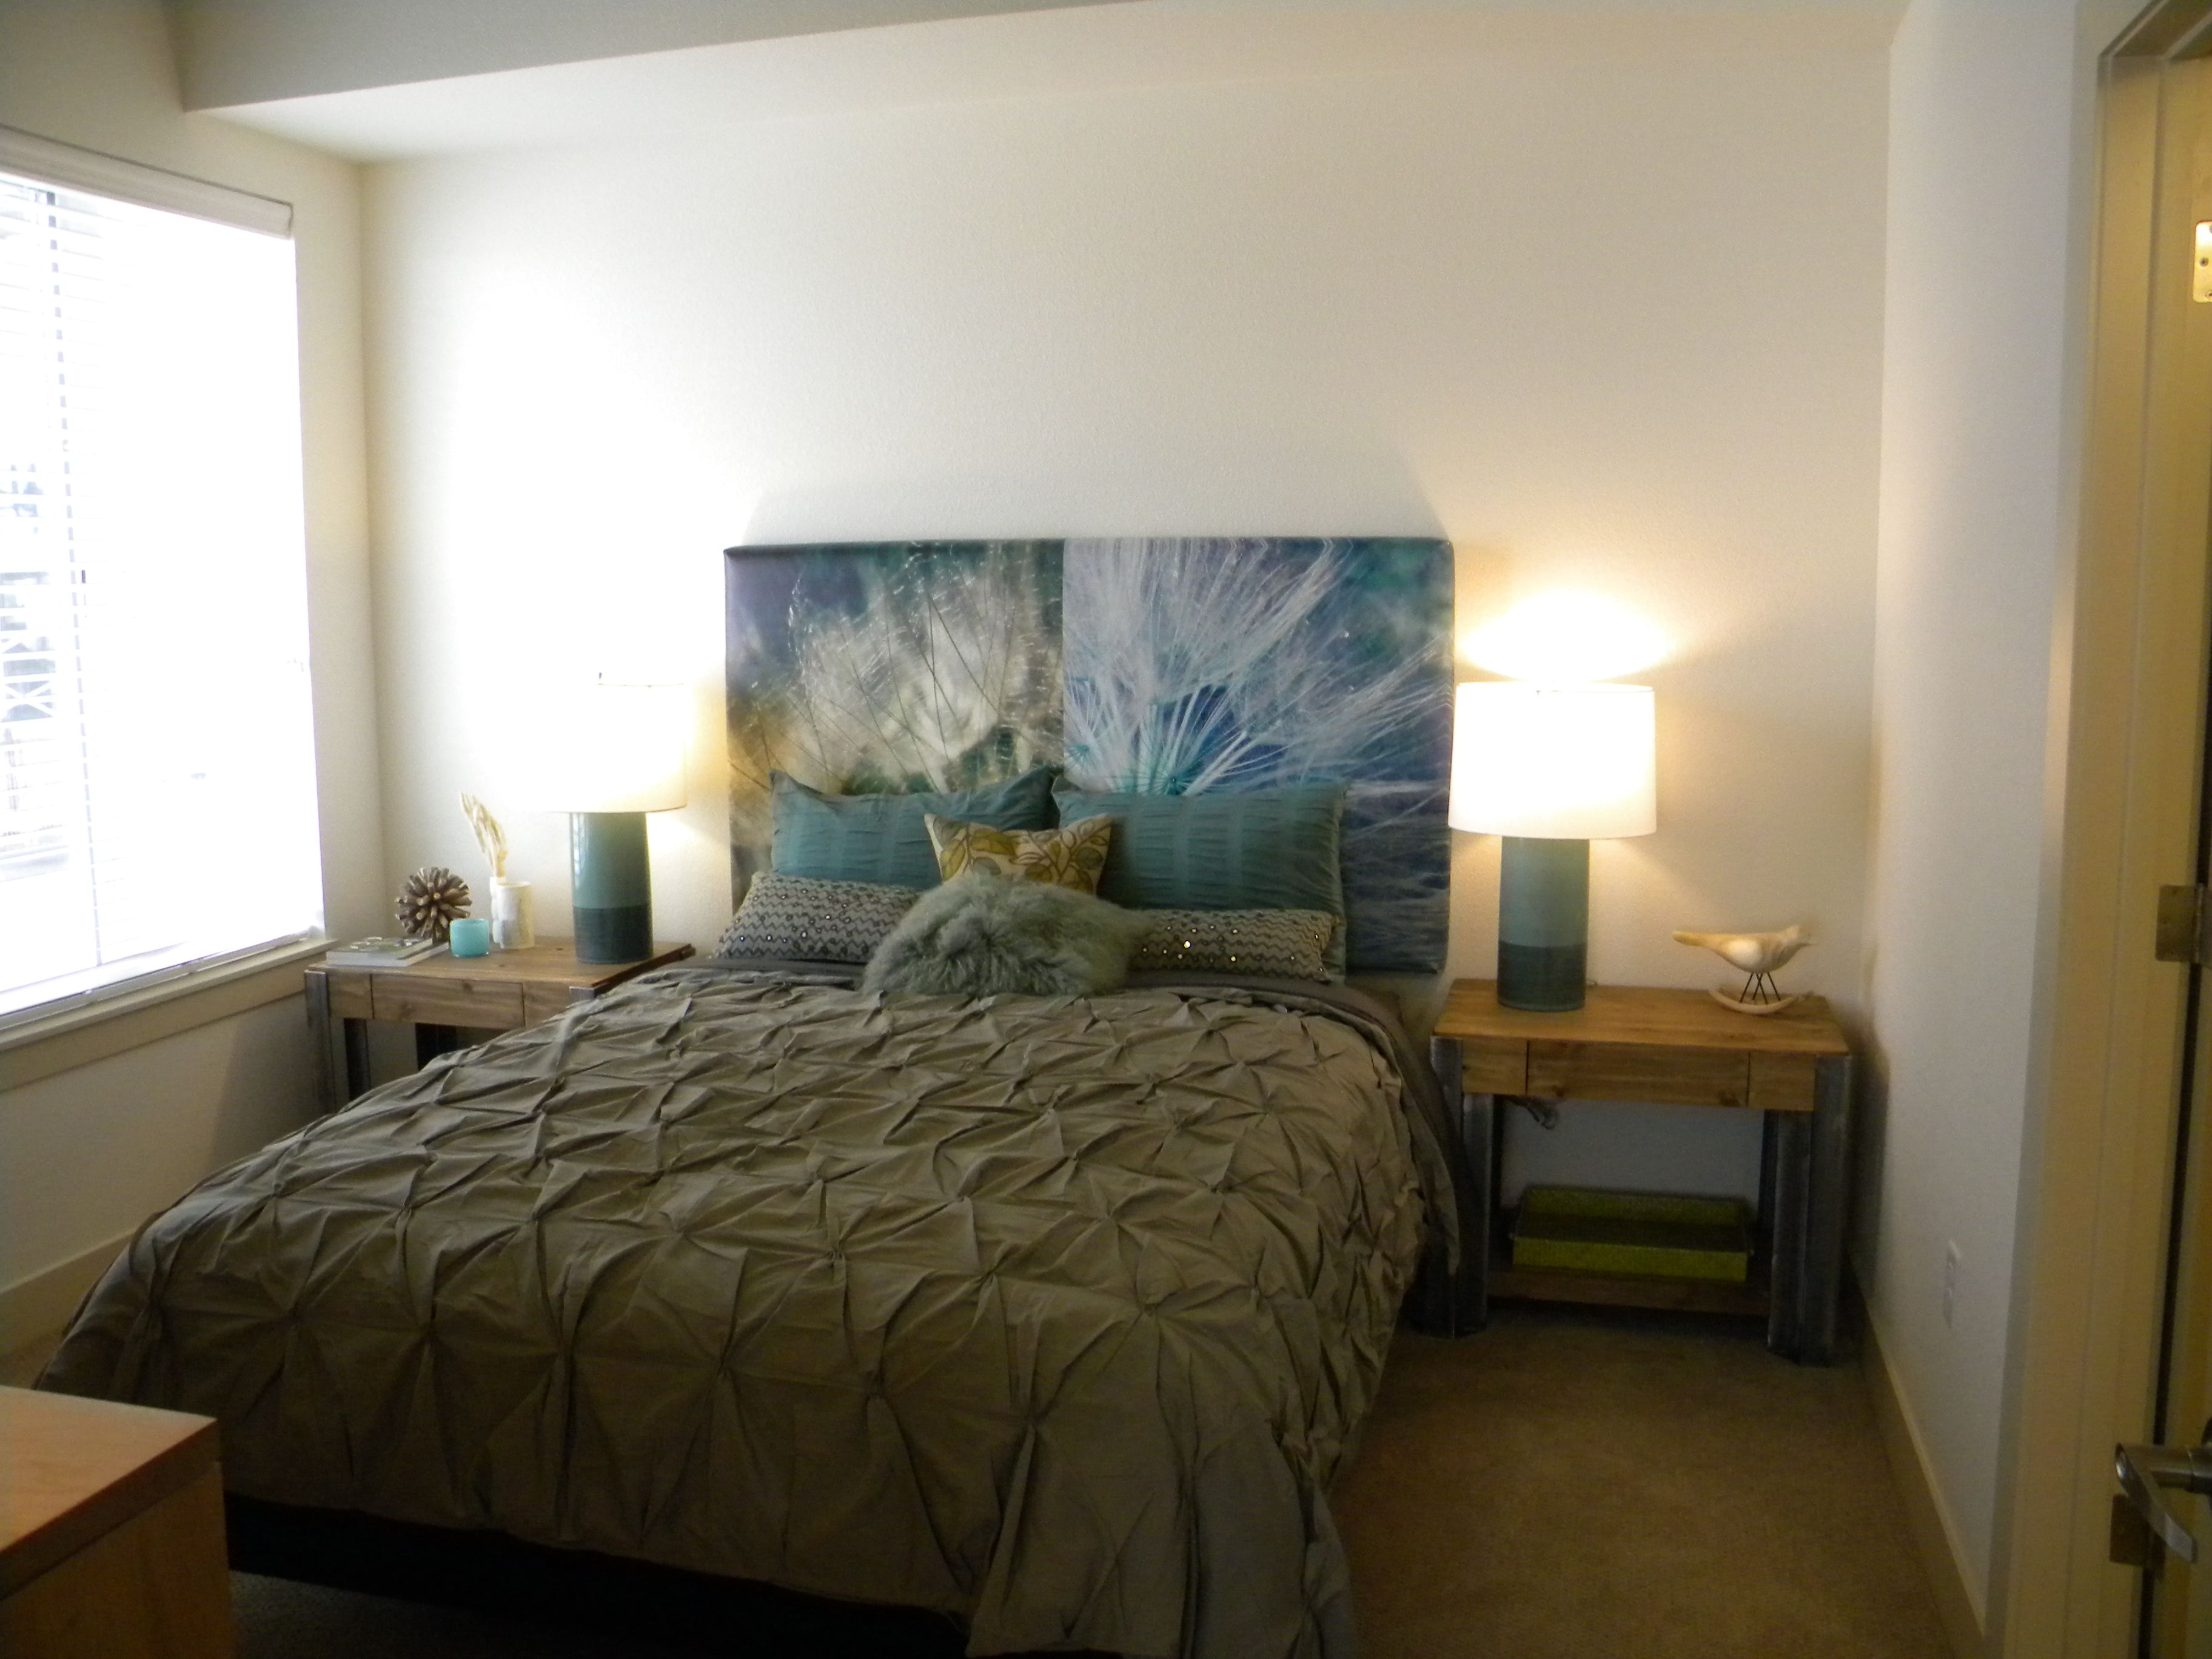 BedroomQuartz Home decor, Home, Furniture